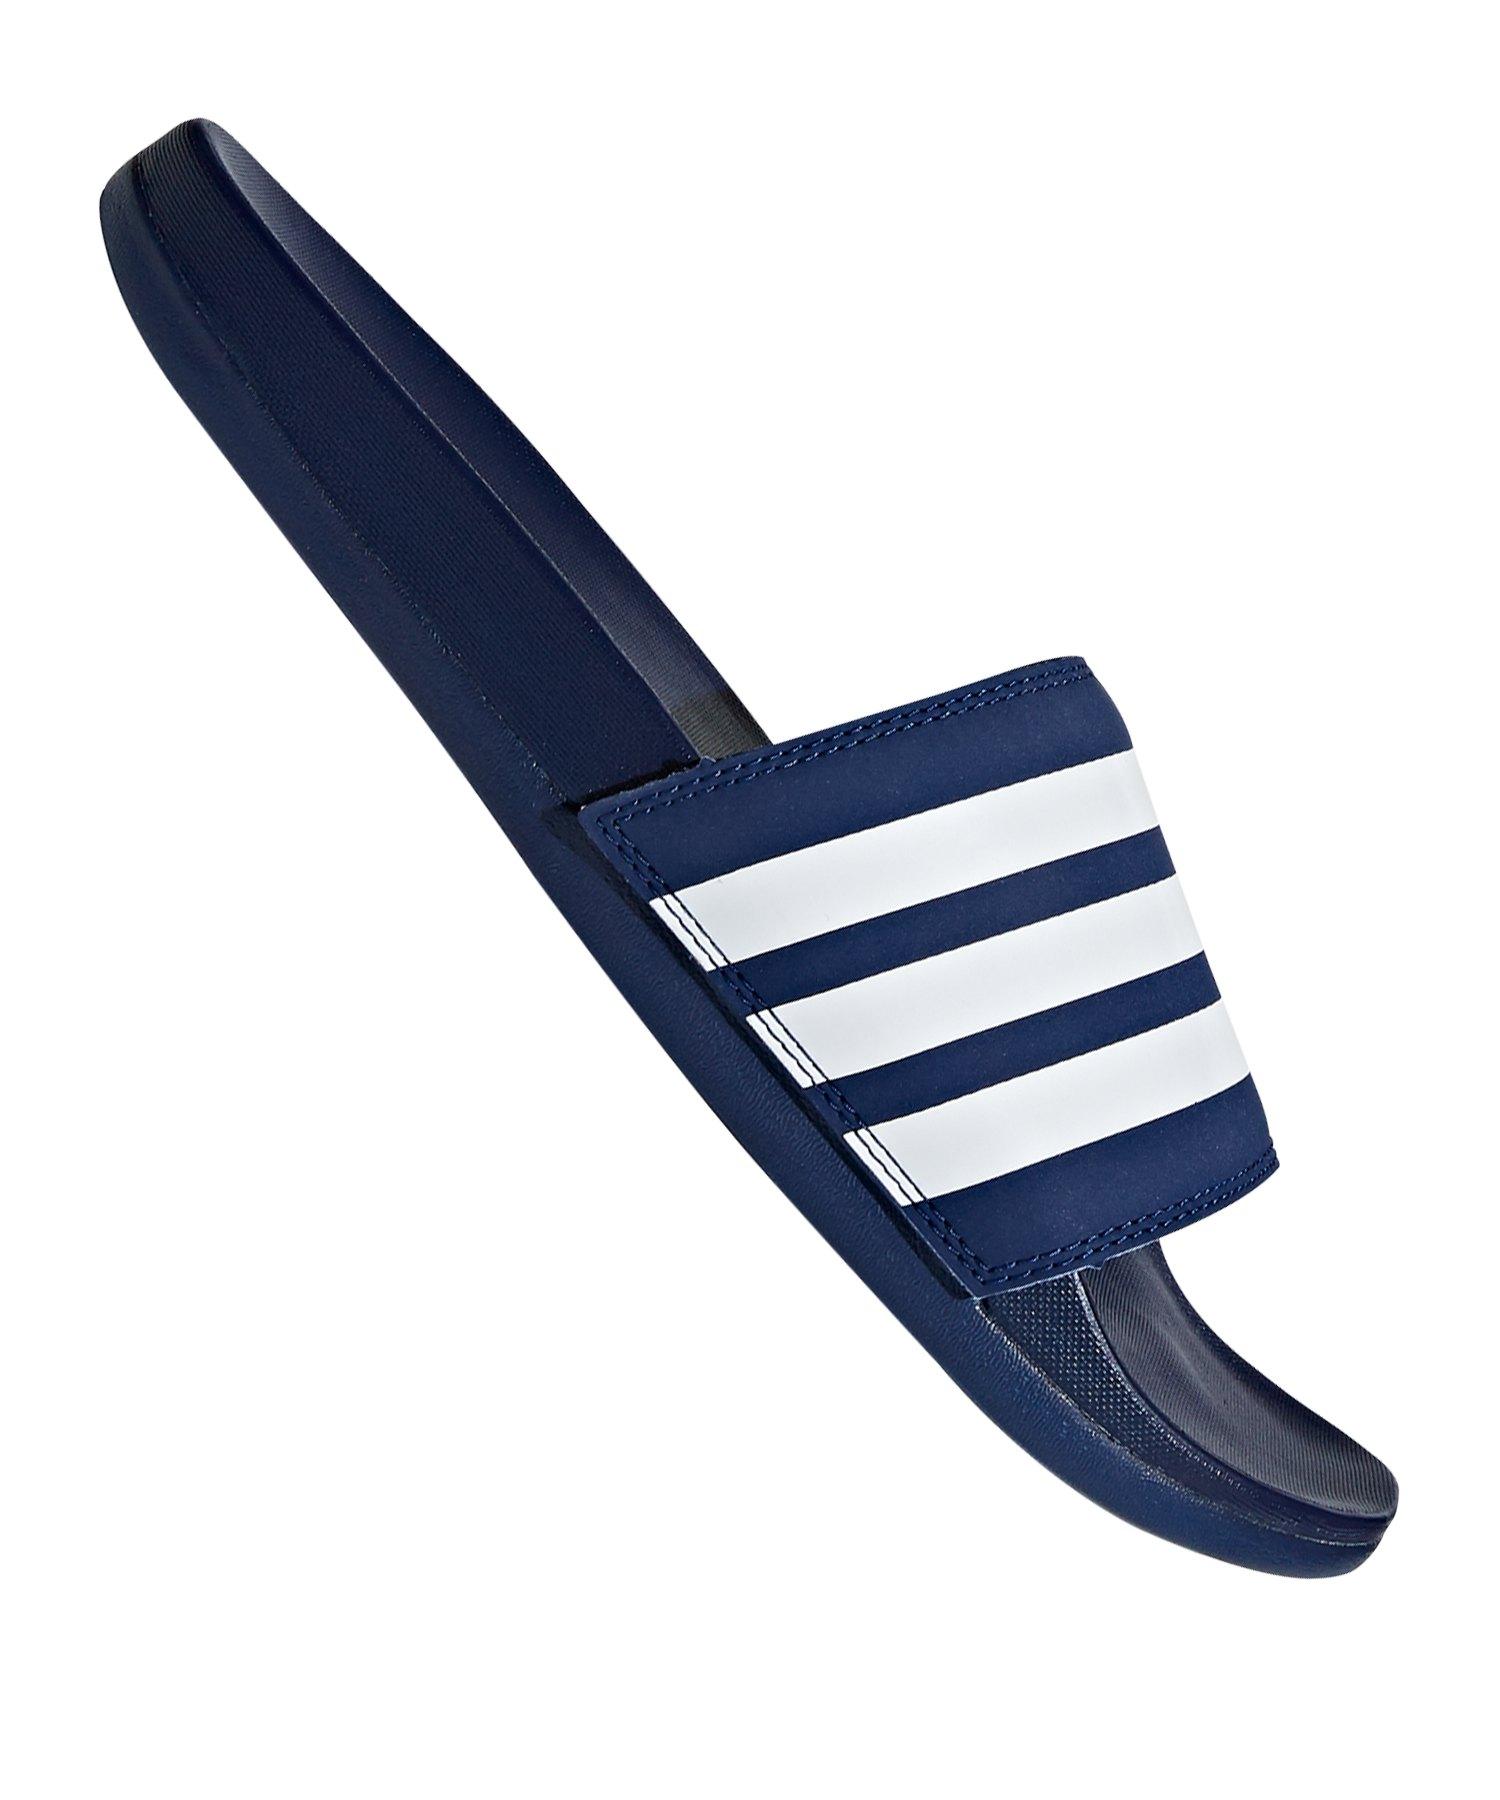 adidas Adilette Comfort Badelatsche Blau Weiss - blau